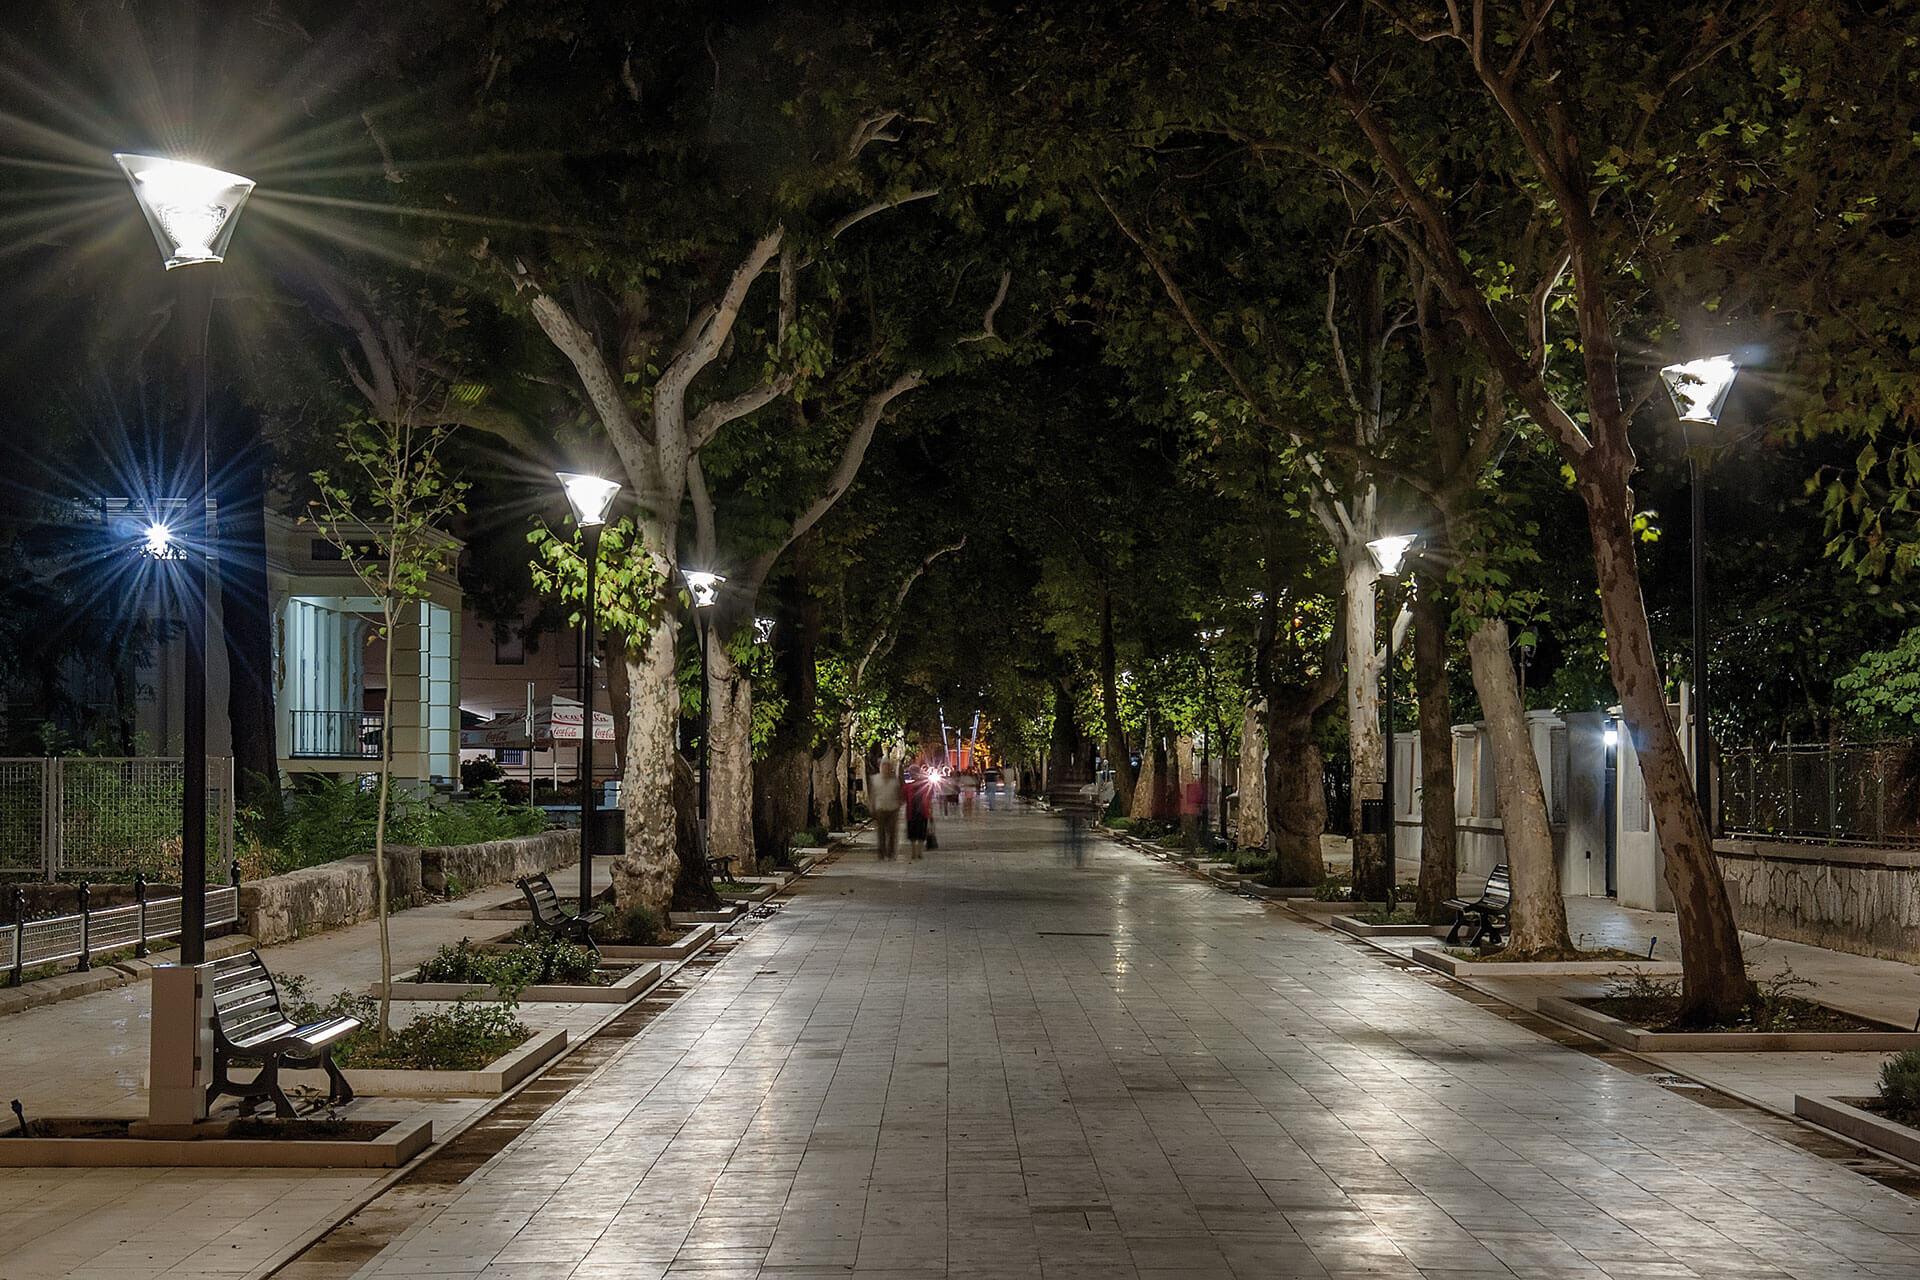 Aesthetic Urban Led Luminaire Creates Vibrant Nocturnal